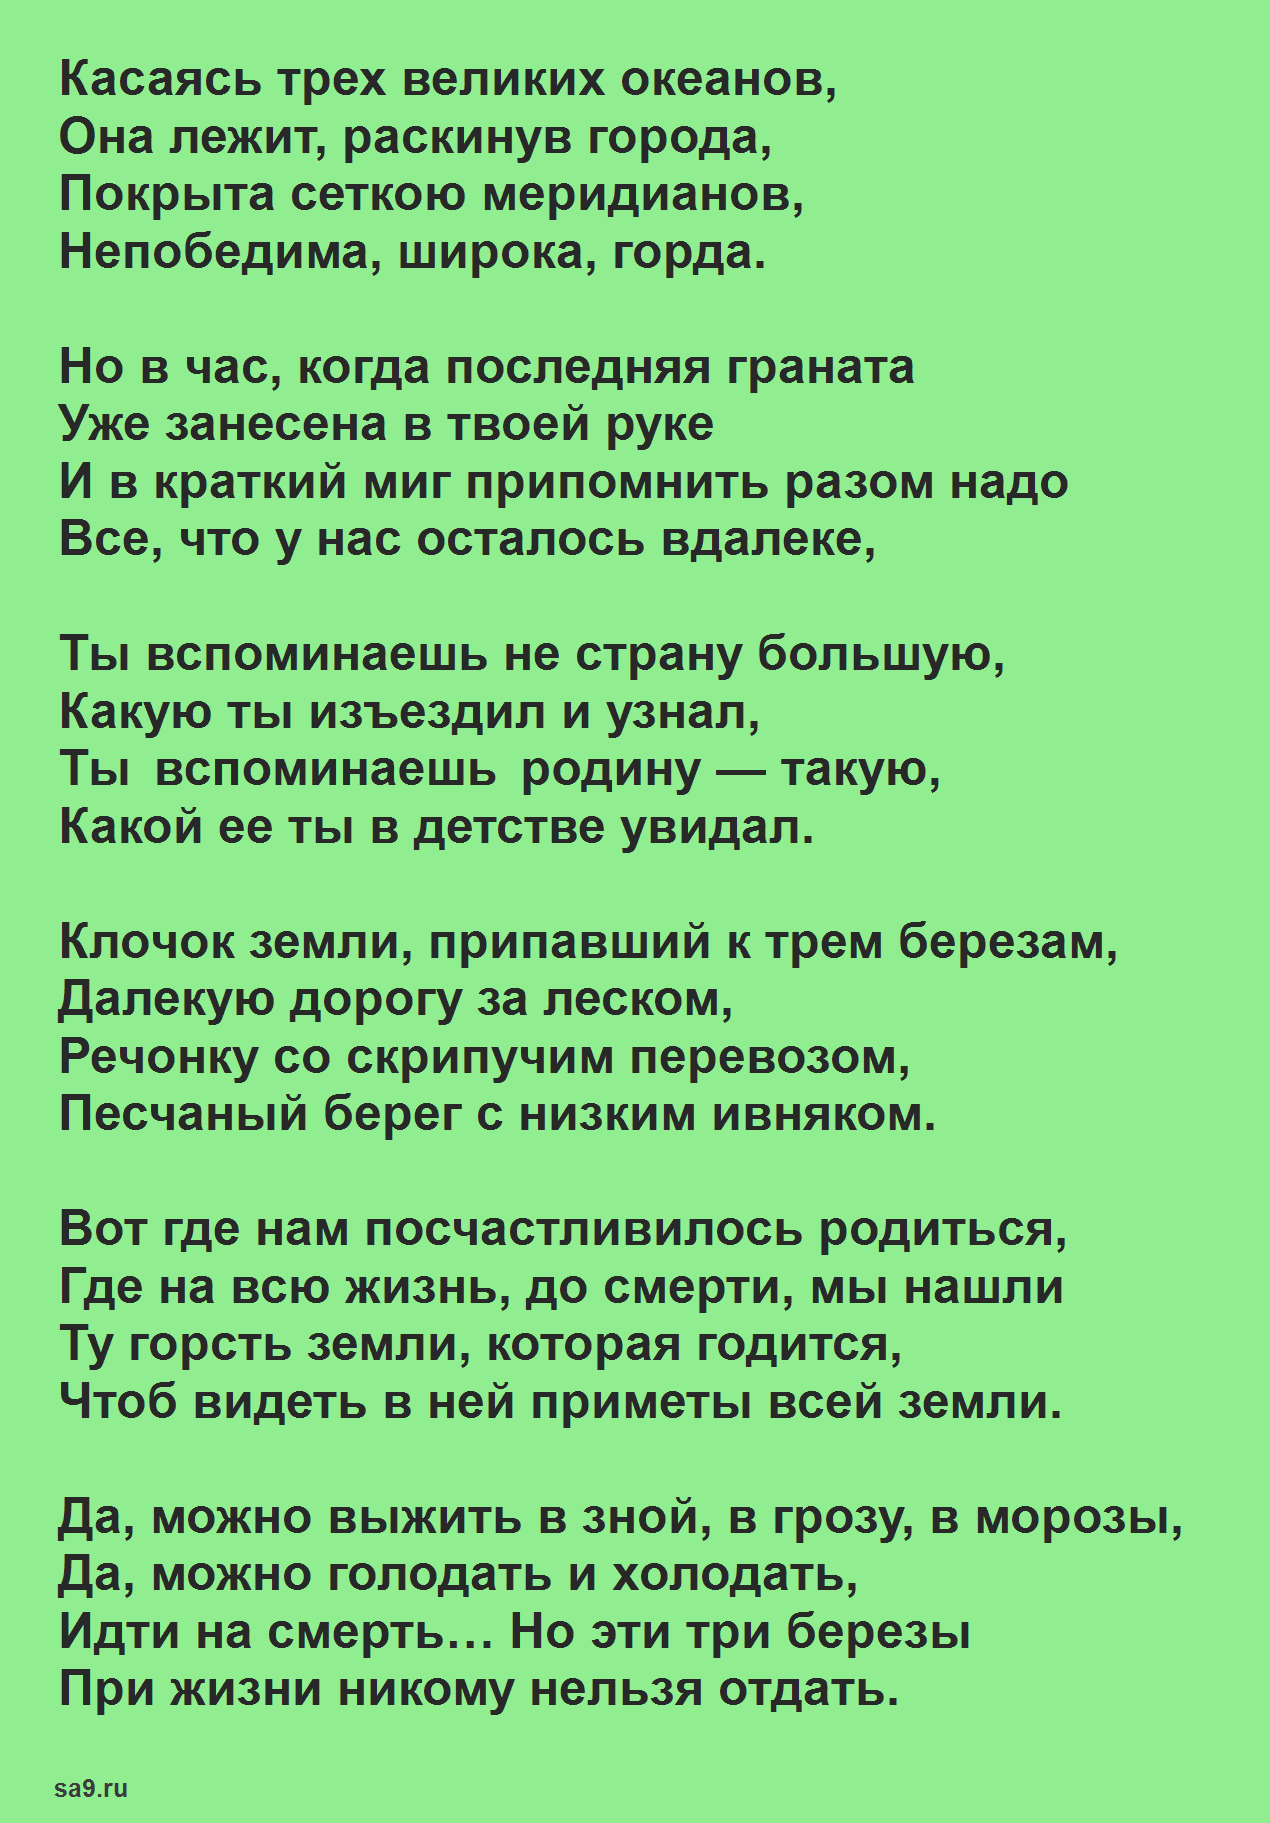 Симонов стихи о Родине - Родина